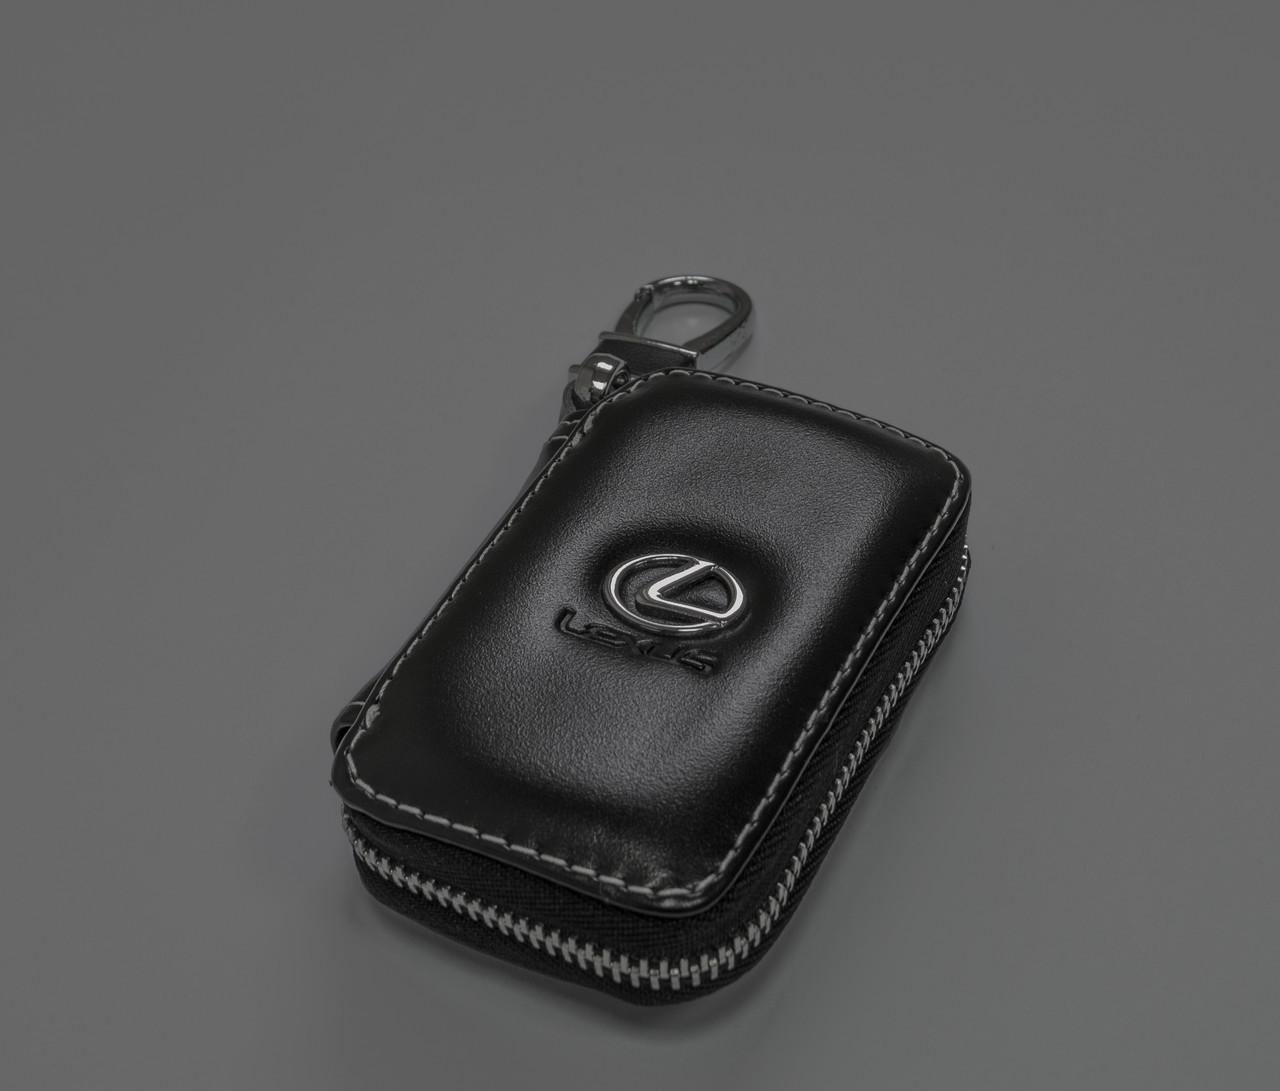 Ключница Carss с логотипом LEXUS 13011 черная